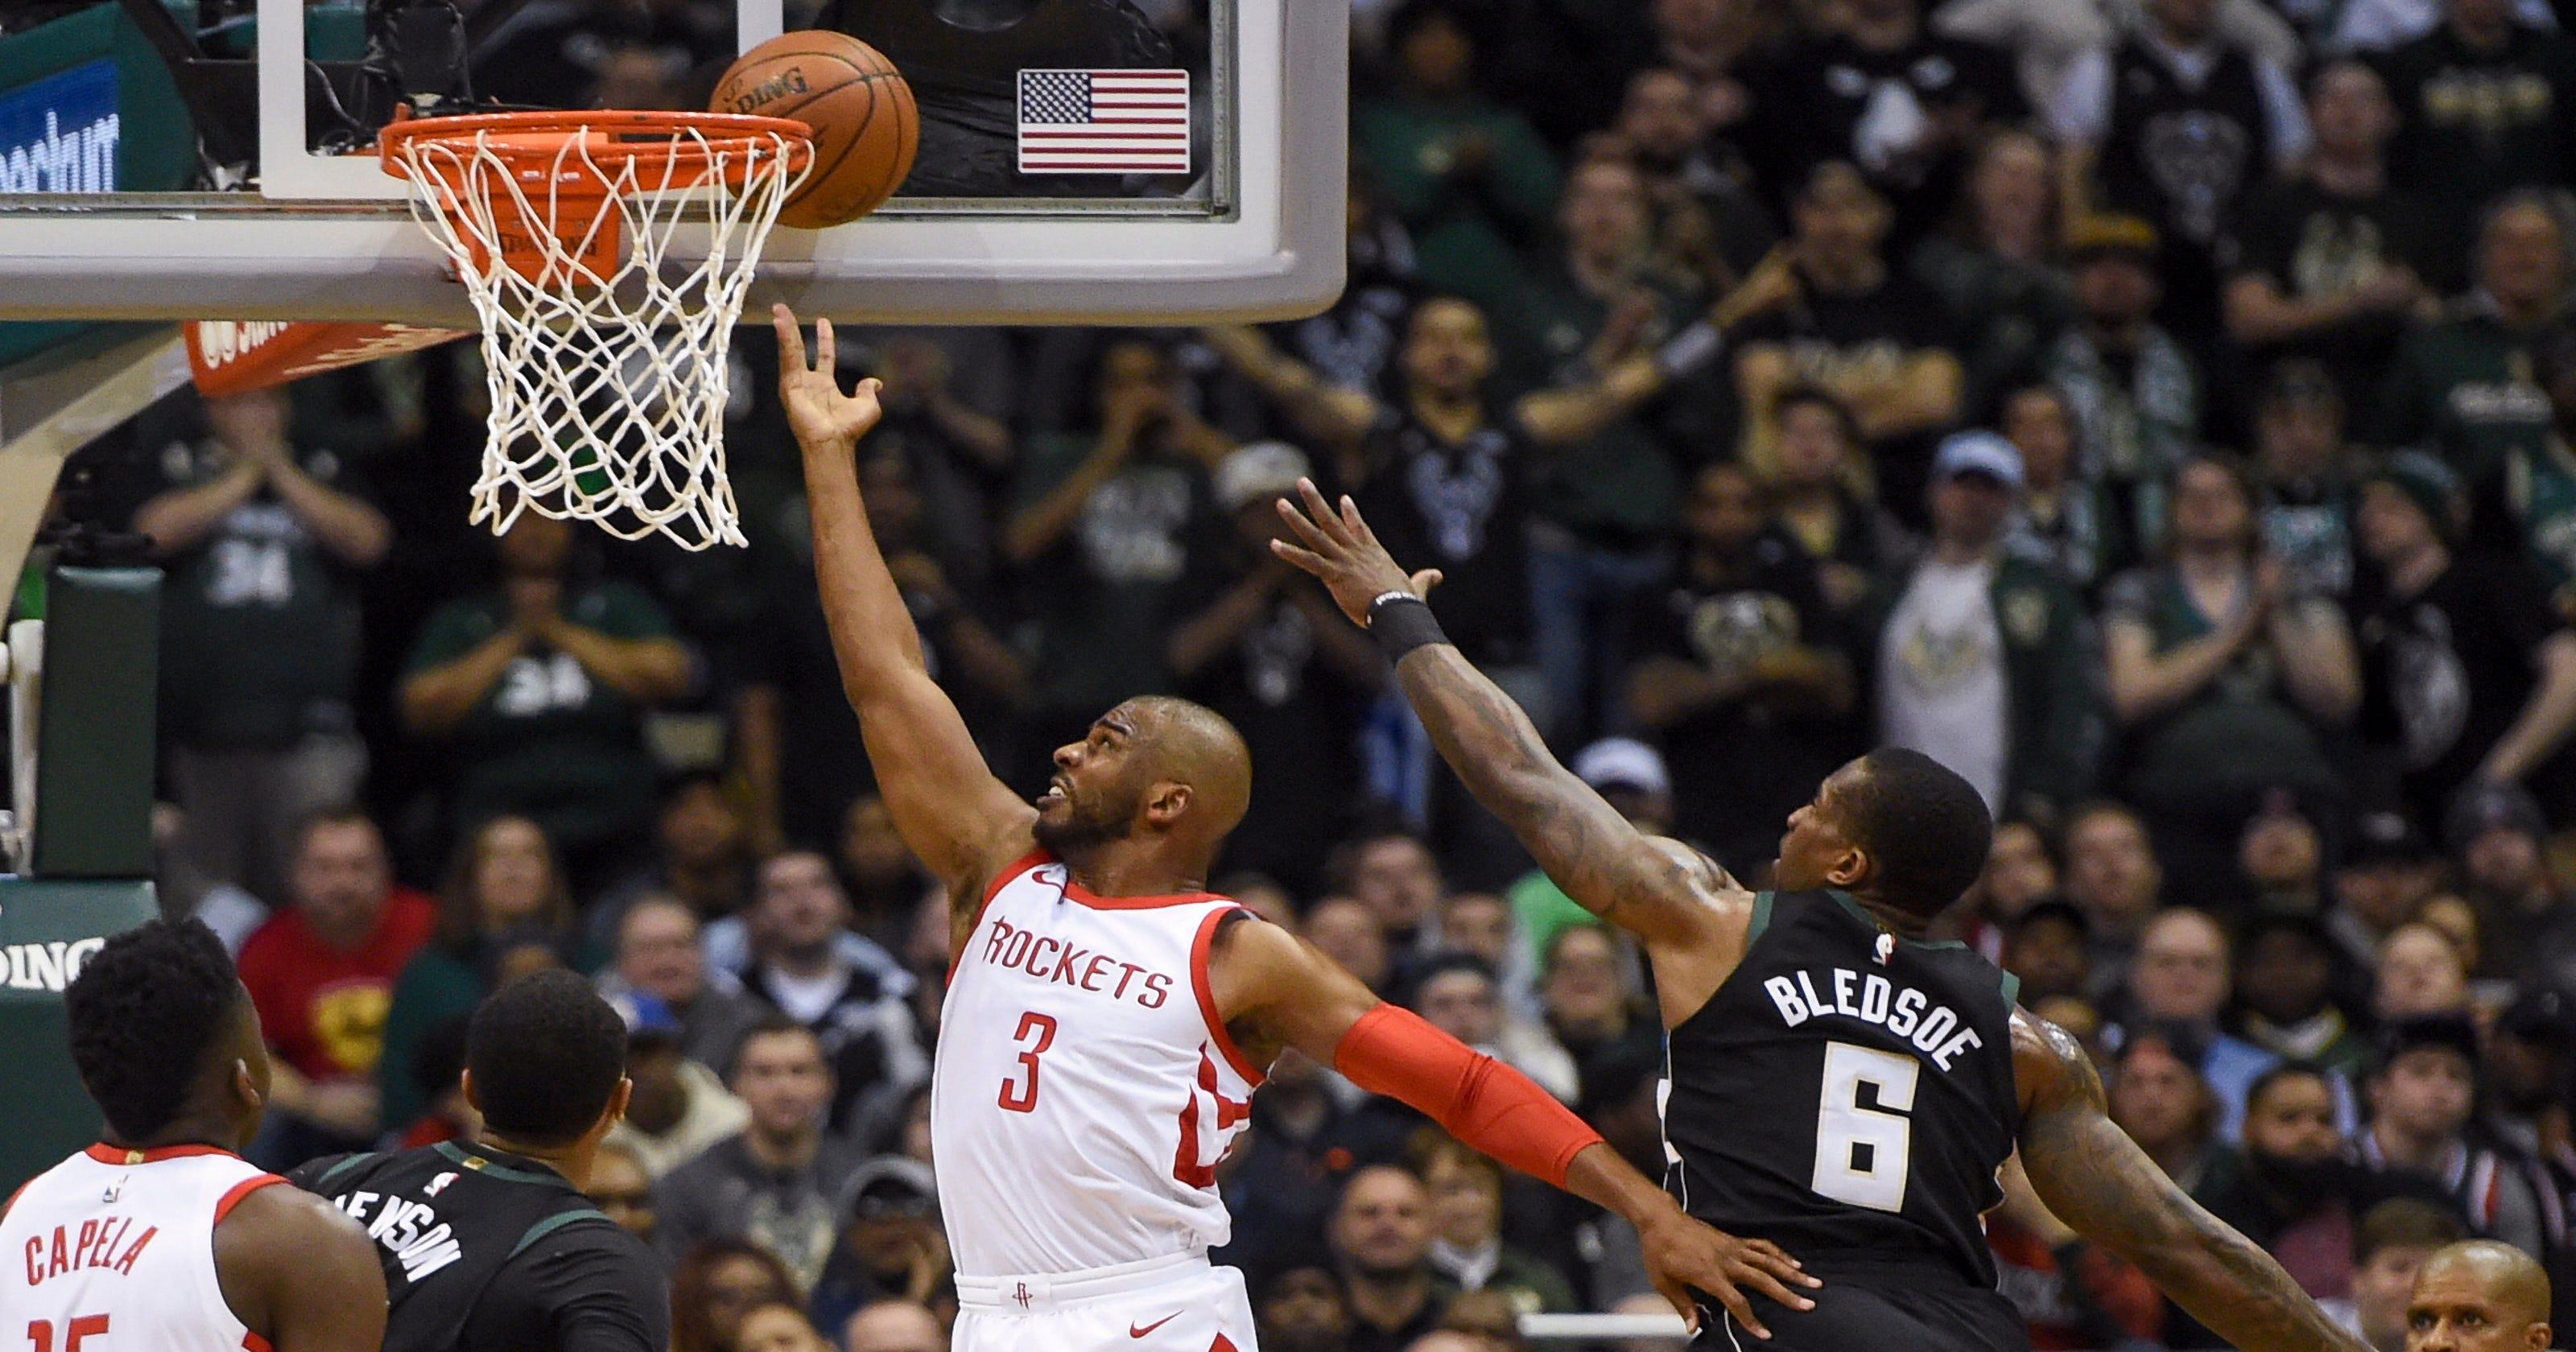 bbd2bcd0d26a Rockets beat Bucks to run winning streak to 17